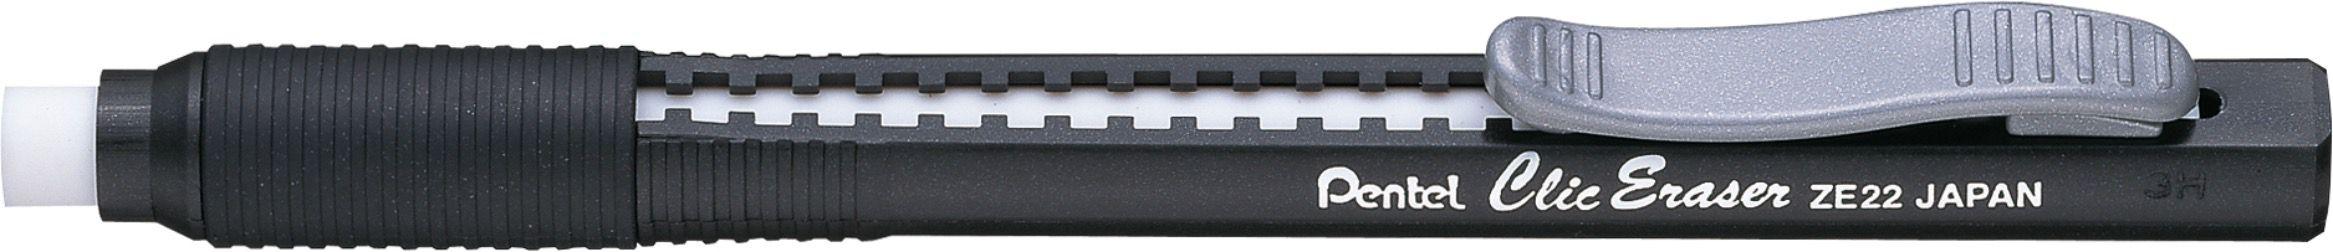 Caneta Borracha Pentel Clic Eraser - Preta